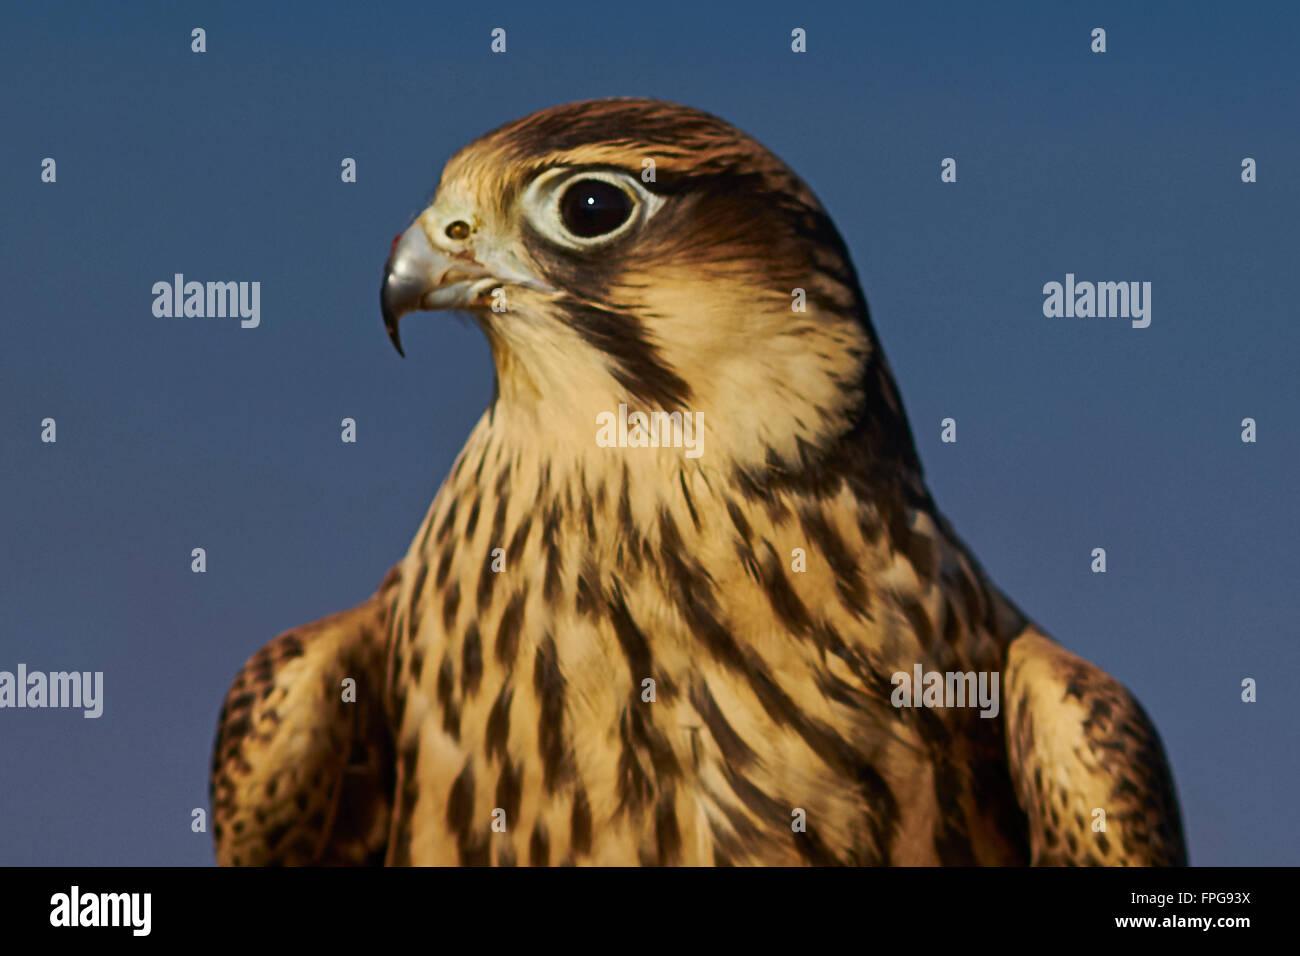 BIRDS OF PREY - Stock Image